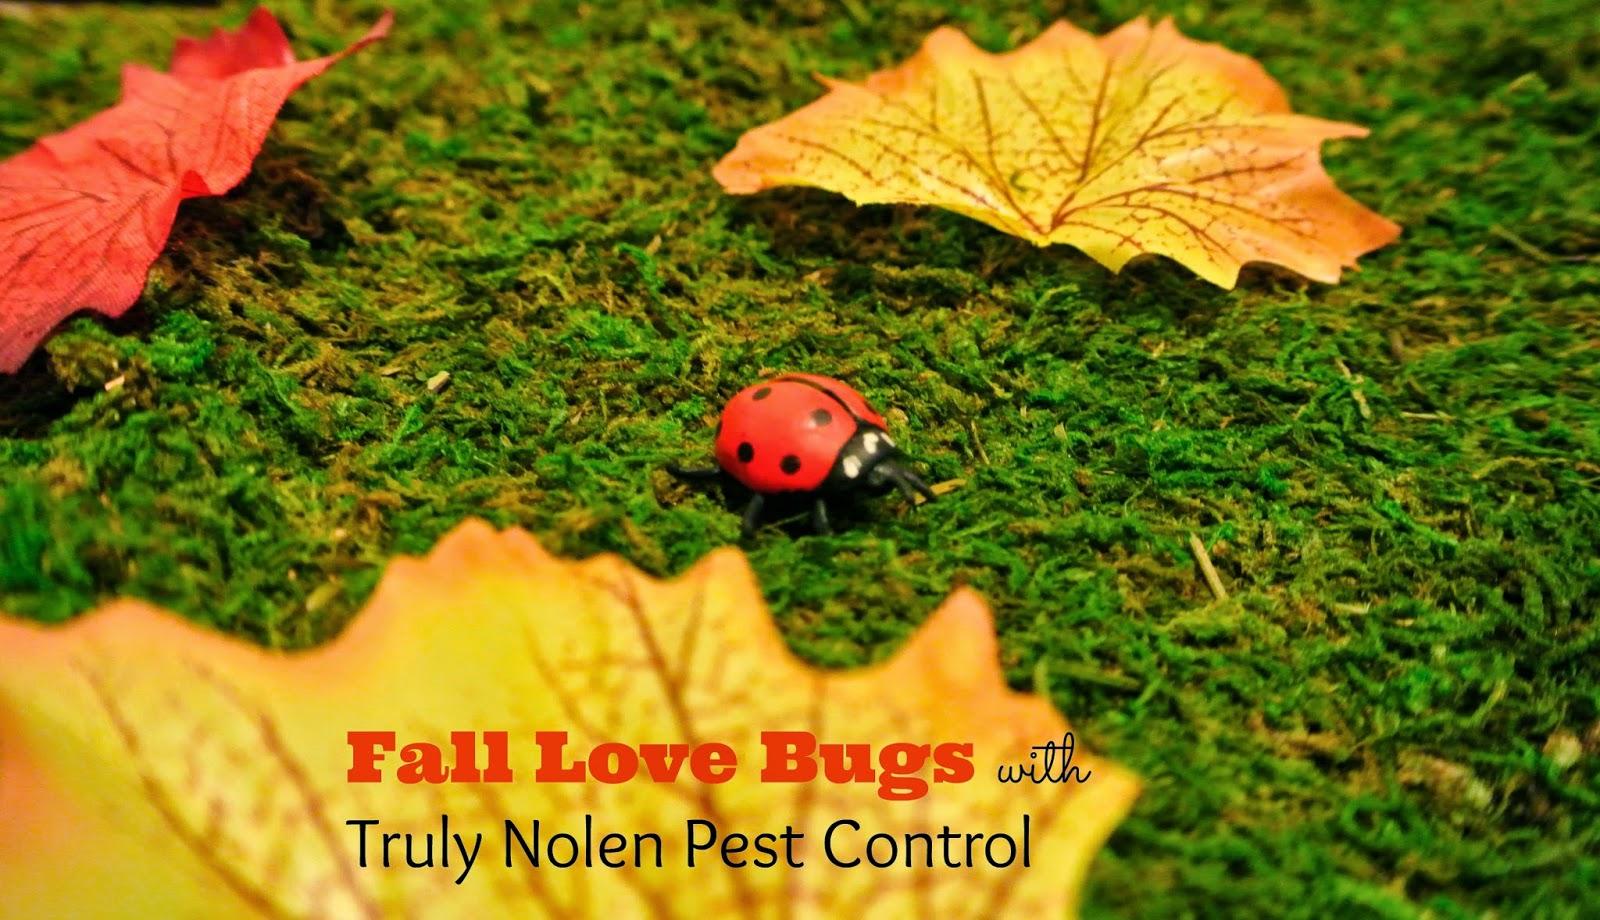 Gardening, Fall Plants, Pests in Gardens